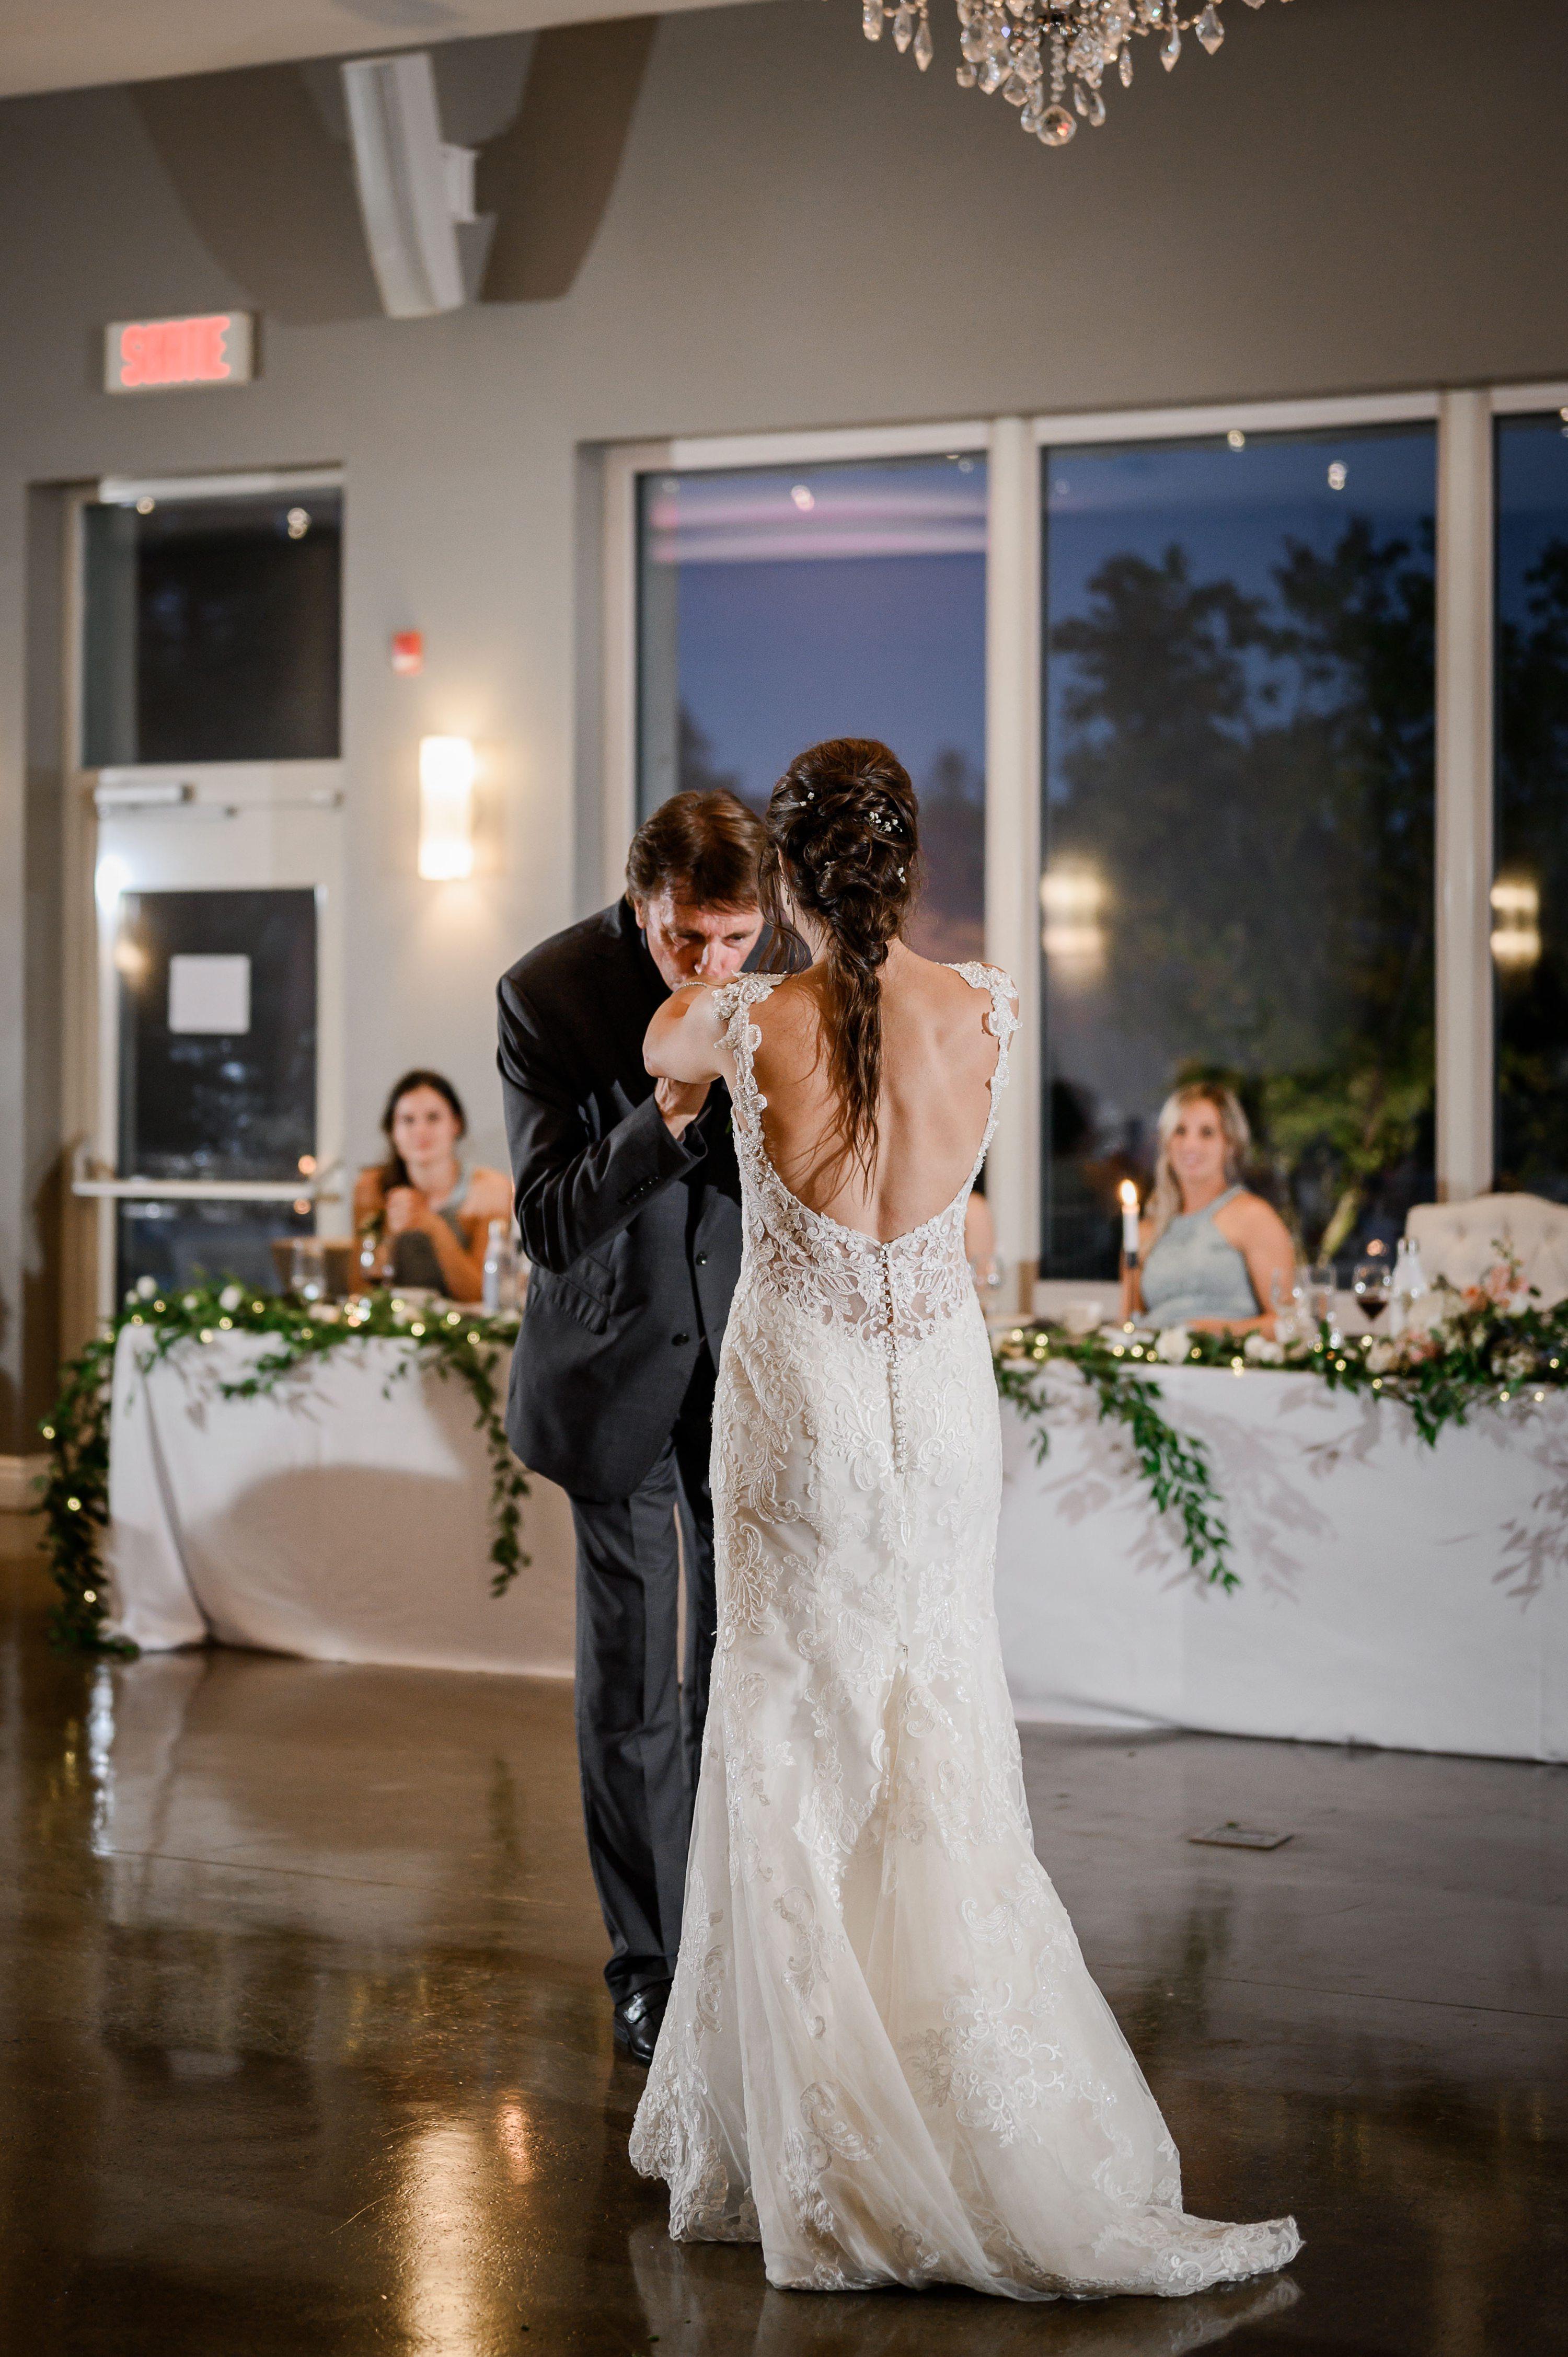 ottawa wedding venue,blue-grey bridesmaids